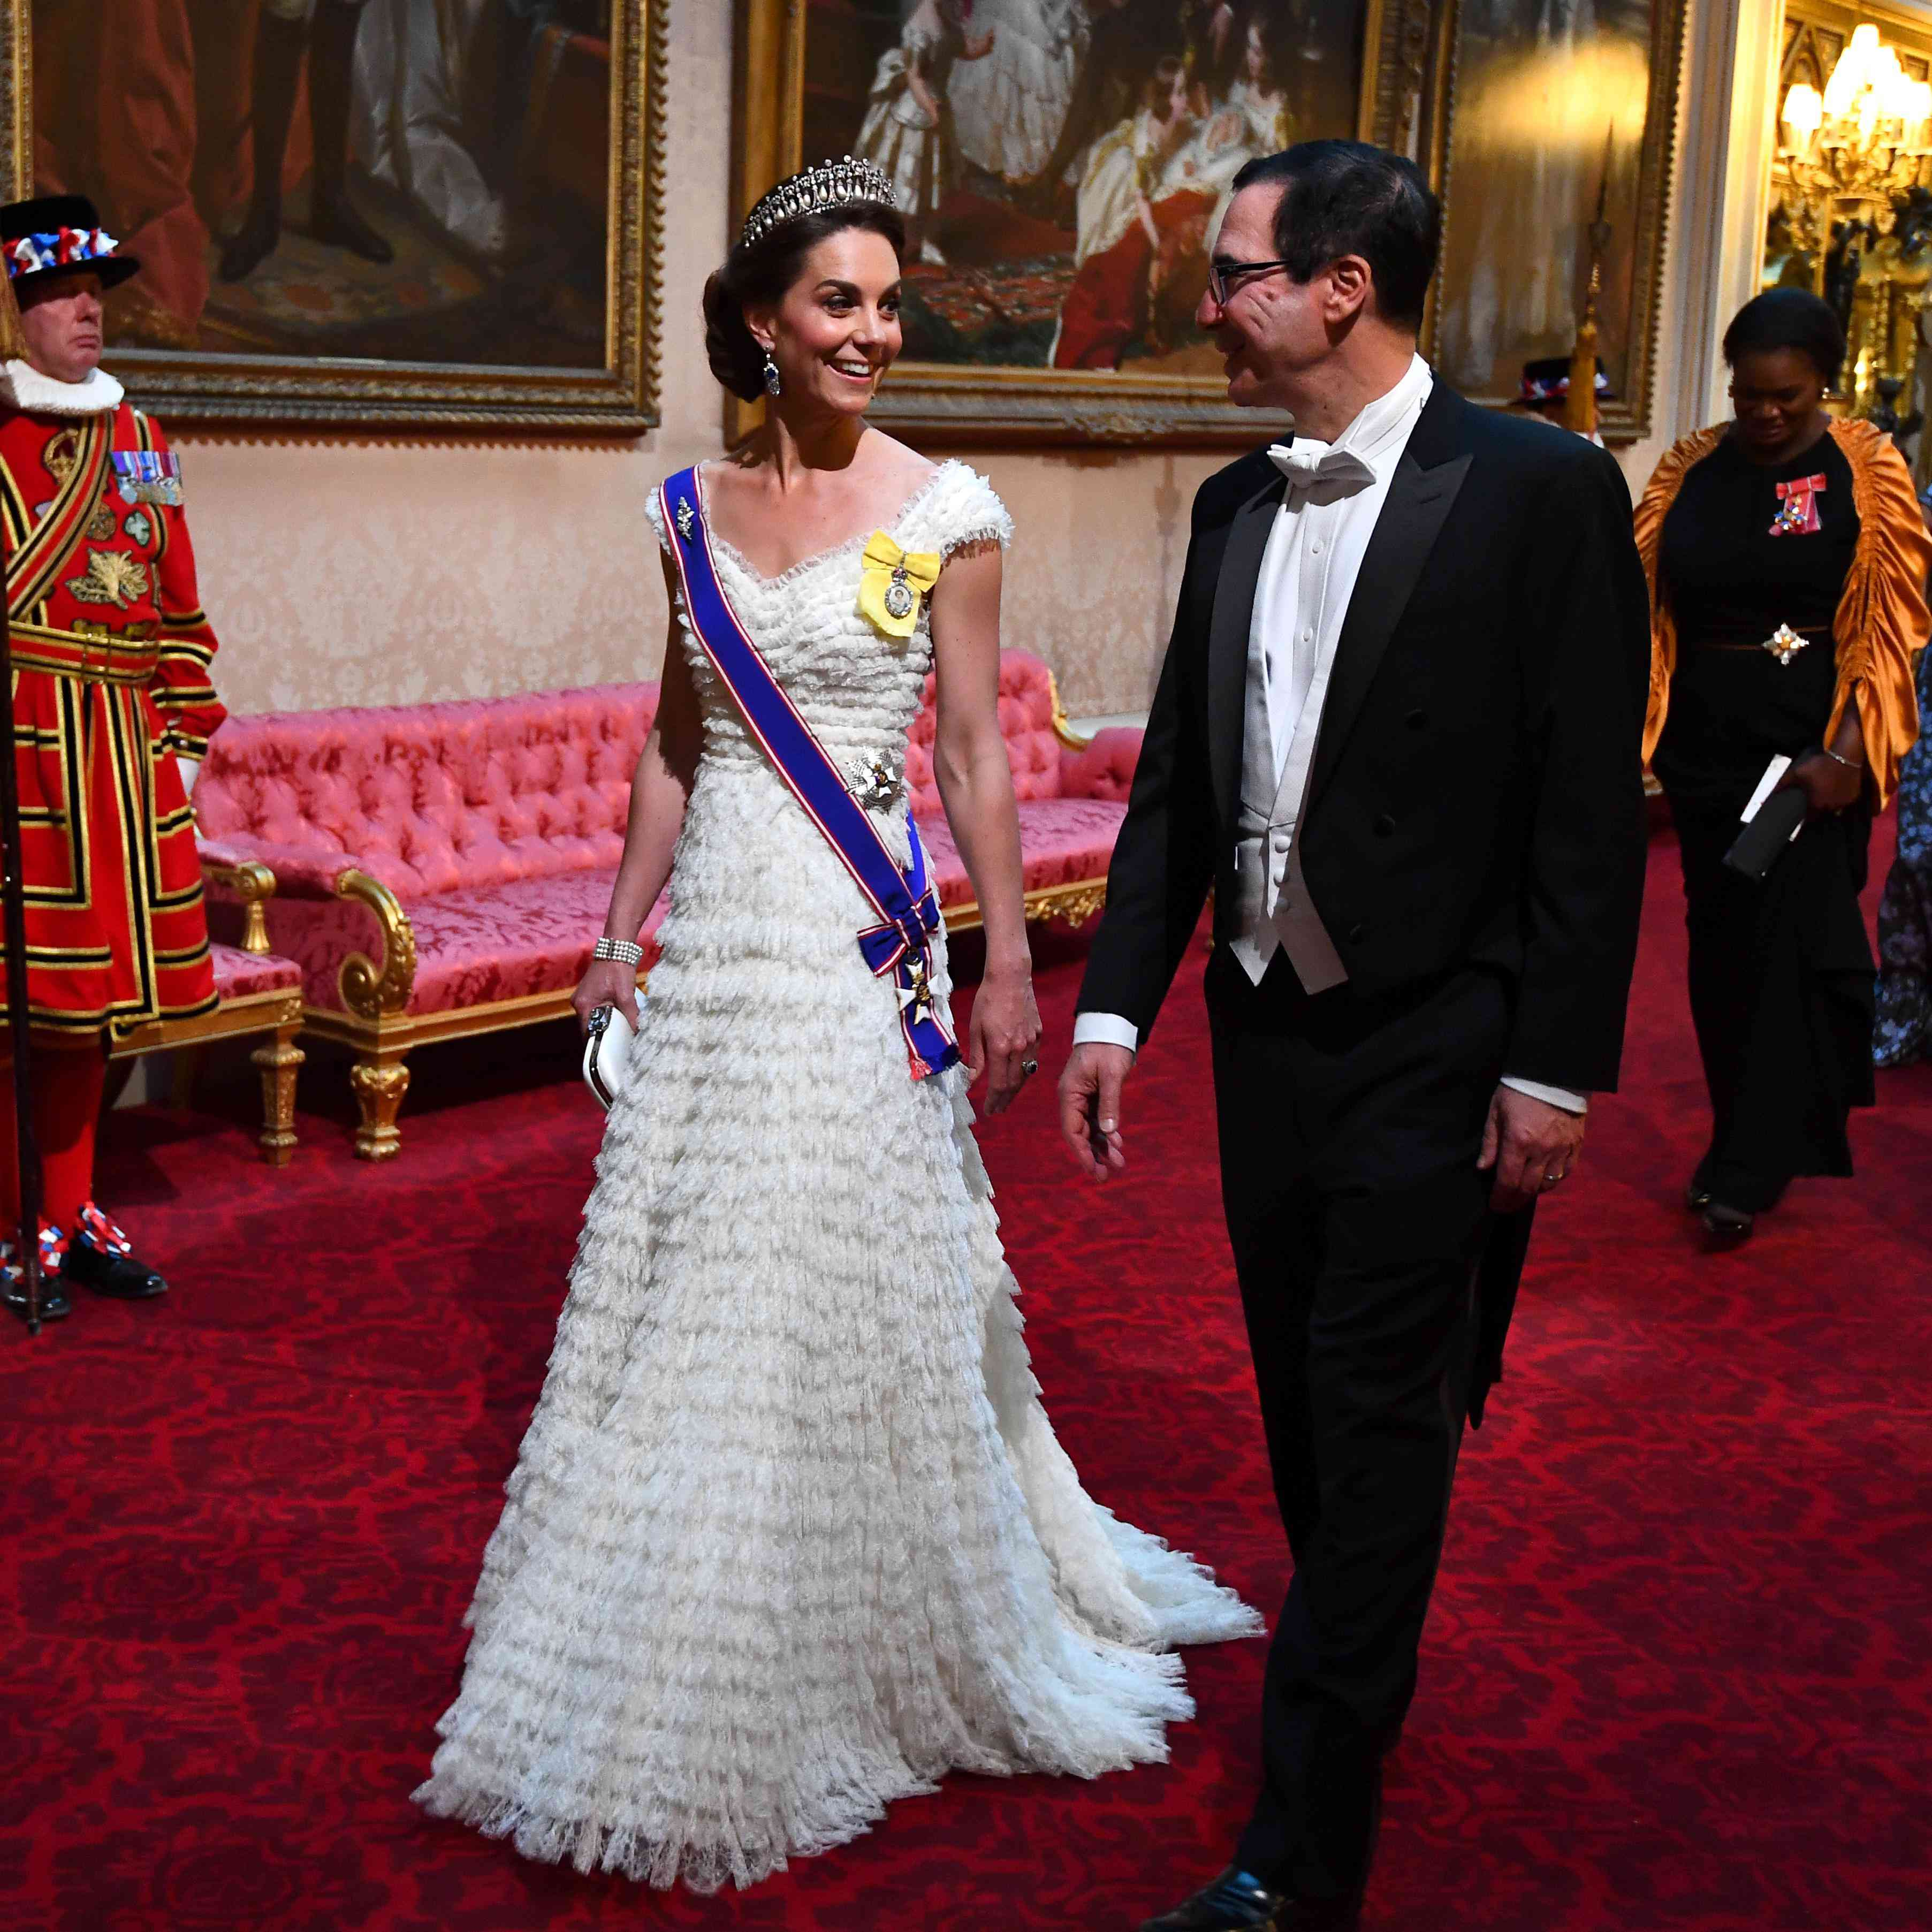 798a84d2eadf5 Kate Middleton Stuns in Princess Diana's Tiara and a White Bridal ...